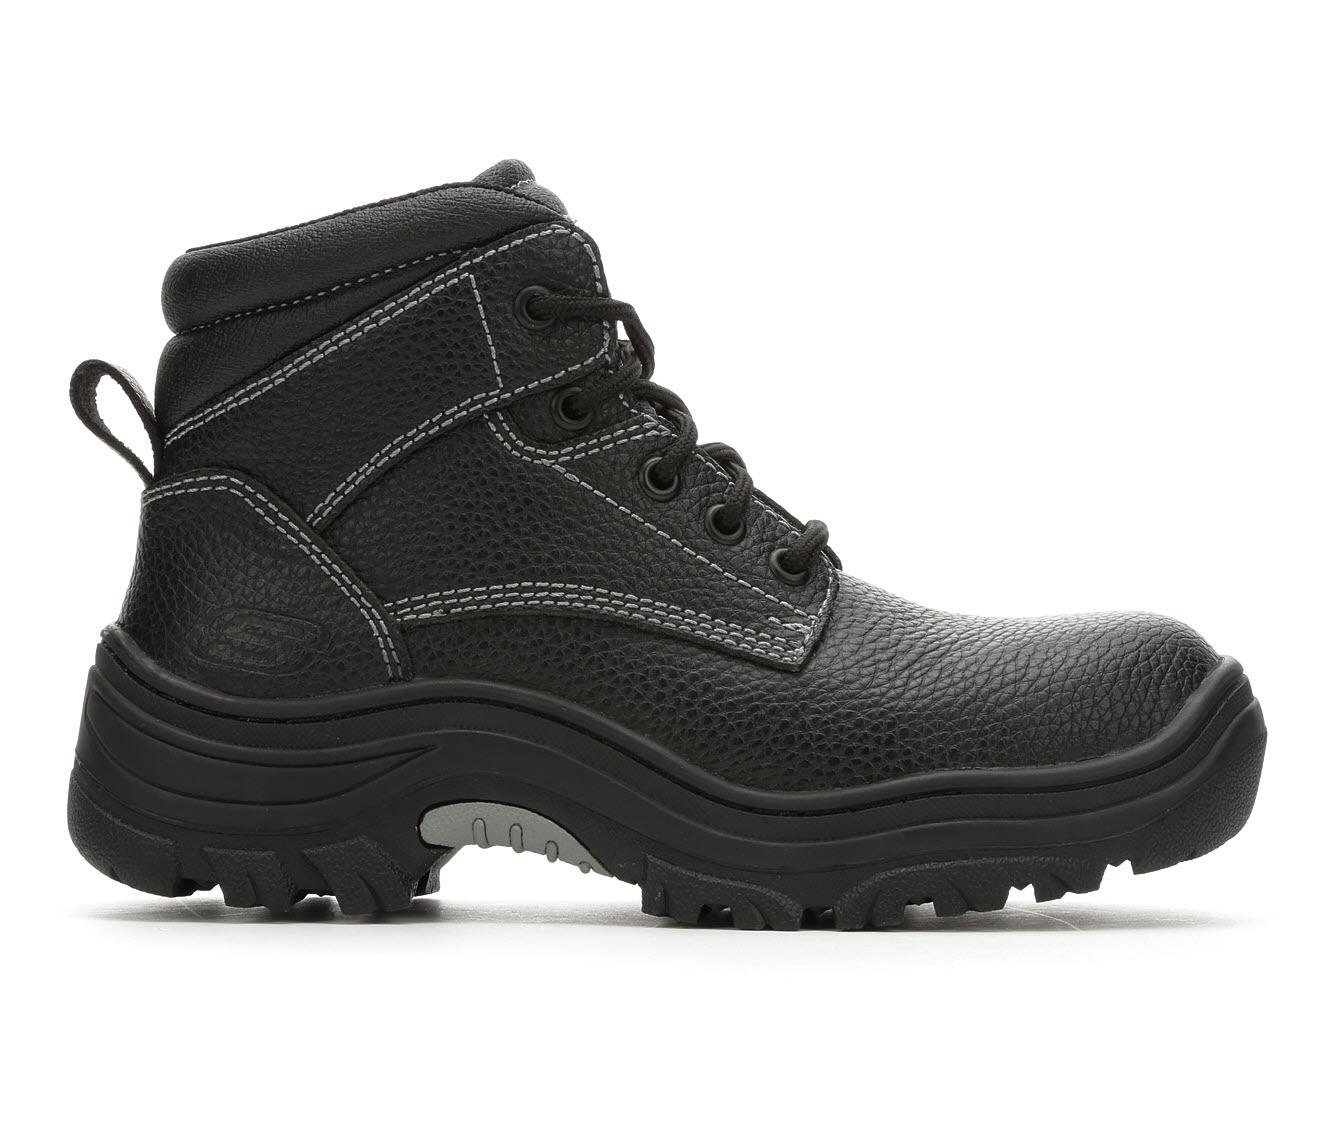 Skechers Work Workshire Krabok 77241 Steel Toe Men's Boots (Black Leather)